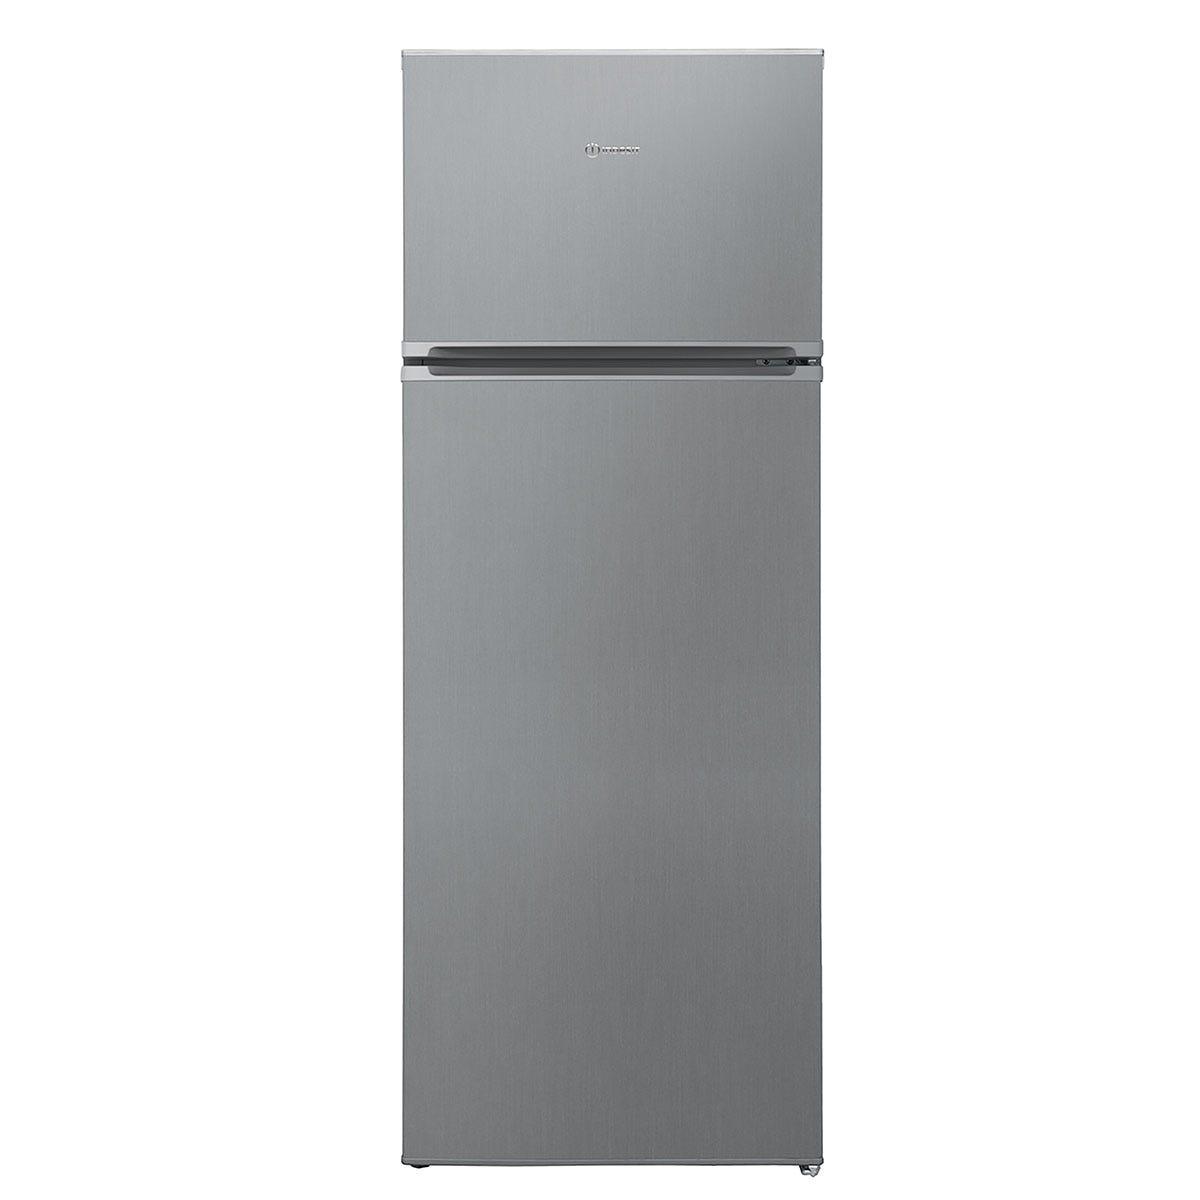 indesit i55tm4110xuk 213l fridge freezer - silver